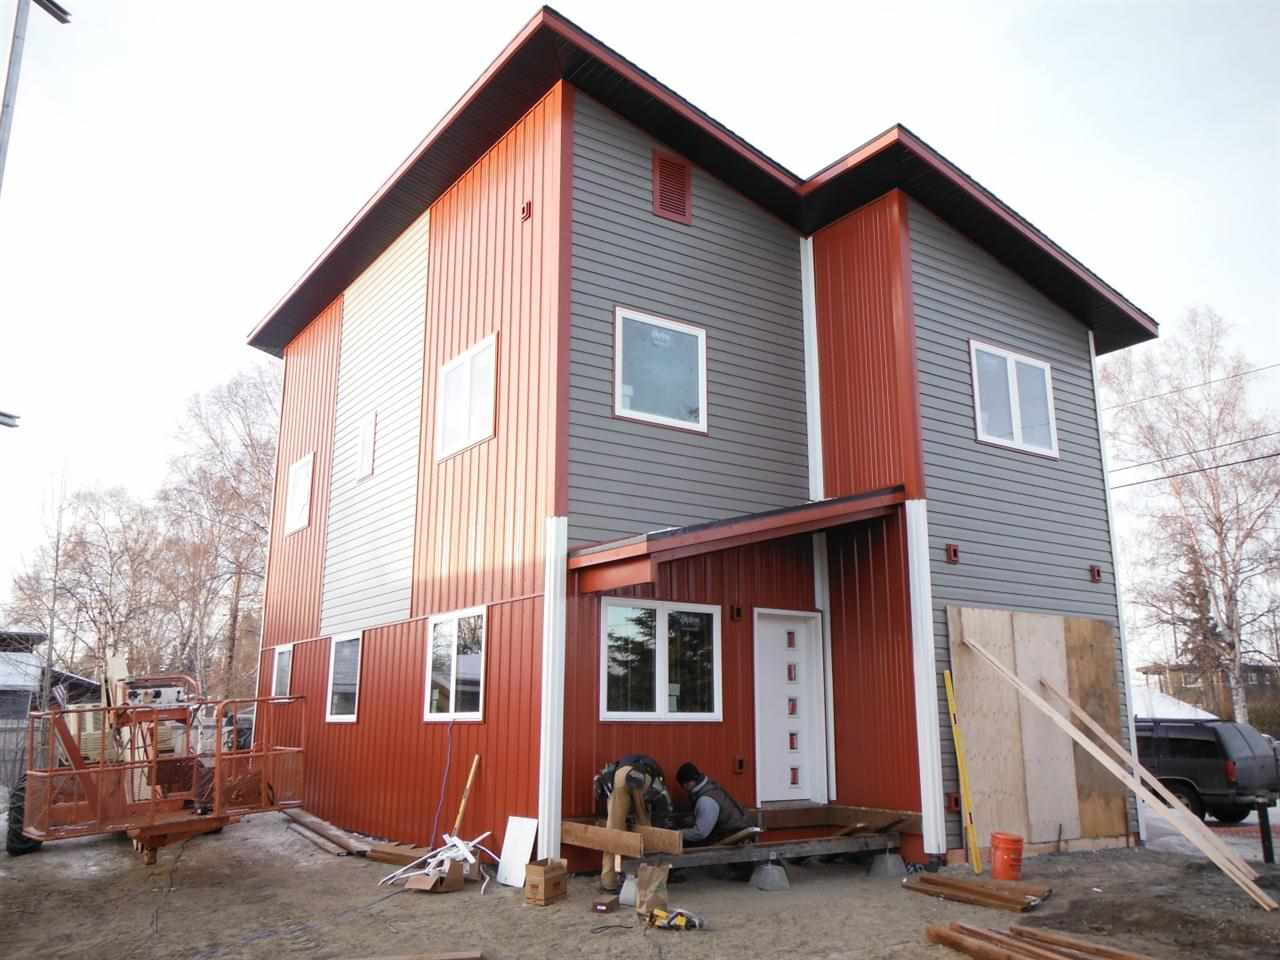 300 State St, Fairbanks, AK 99701